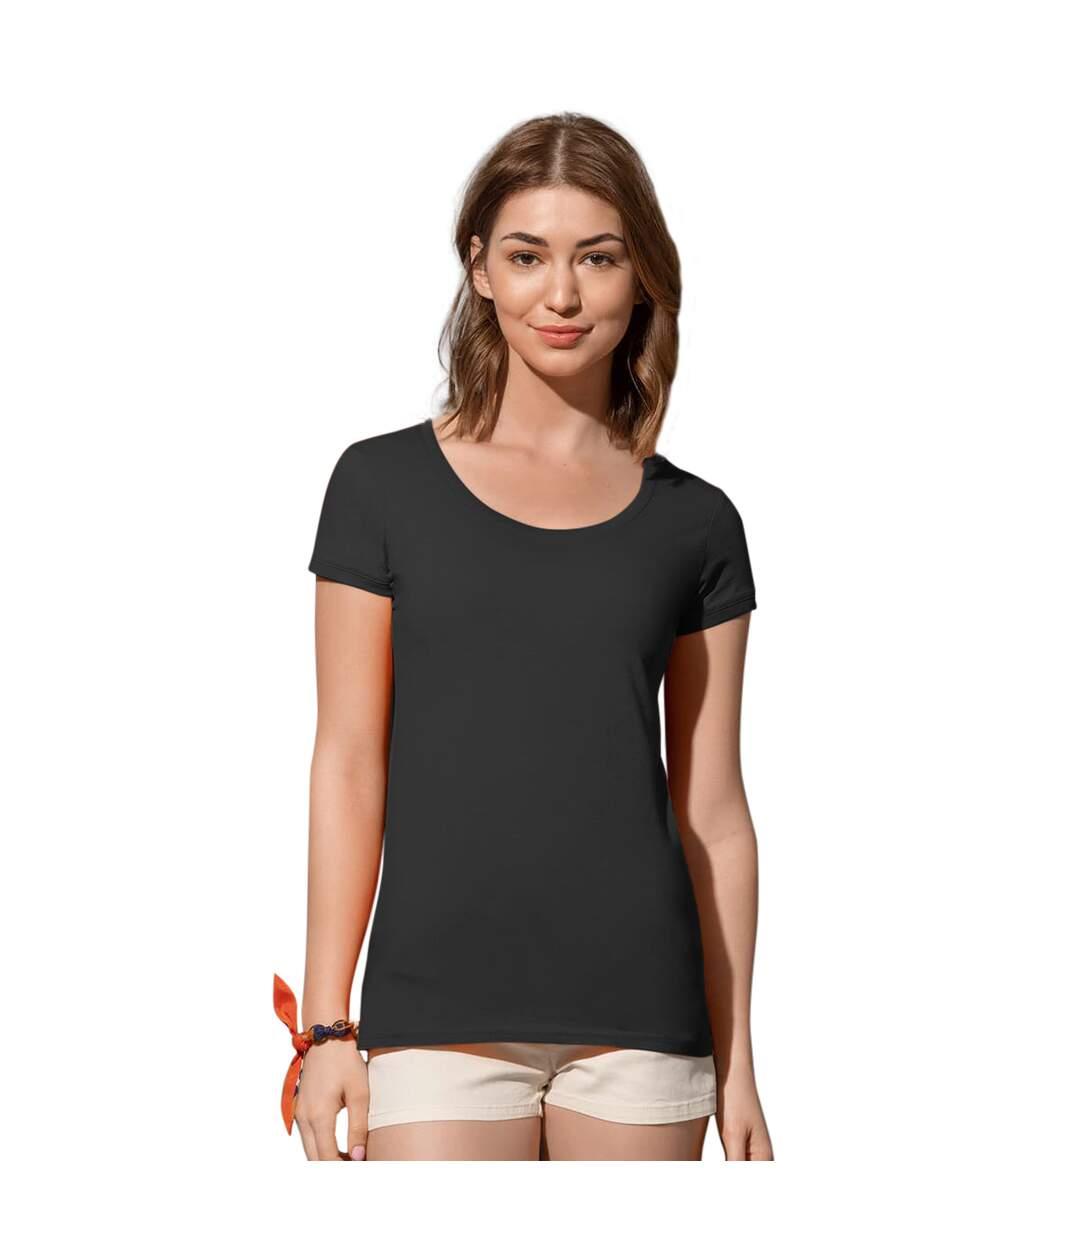 Stedman - T-Shirt Megan - Femme (Blanc cassé) - UTAB363